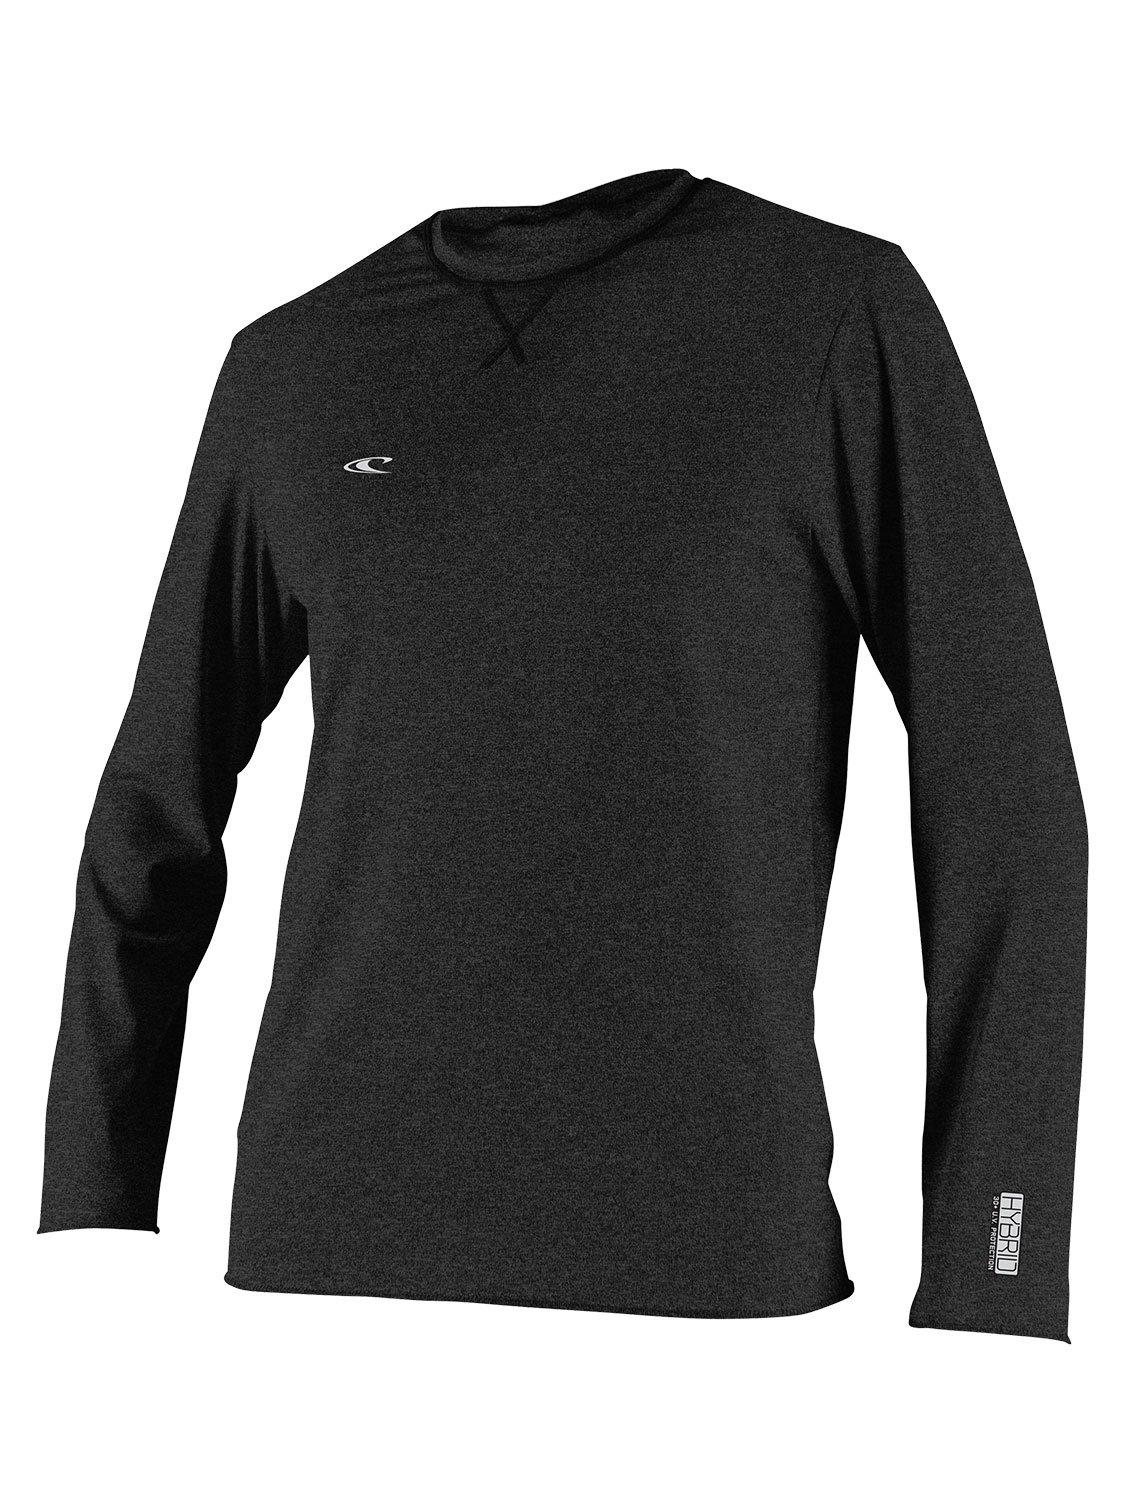 O'Neill Wetsuits Men's Hybrid UPF 50+ Long Sleeve Sun Shirt, Black, Large by O'Neill Wetsuits